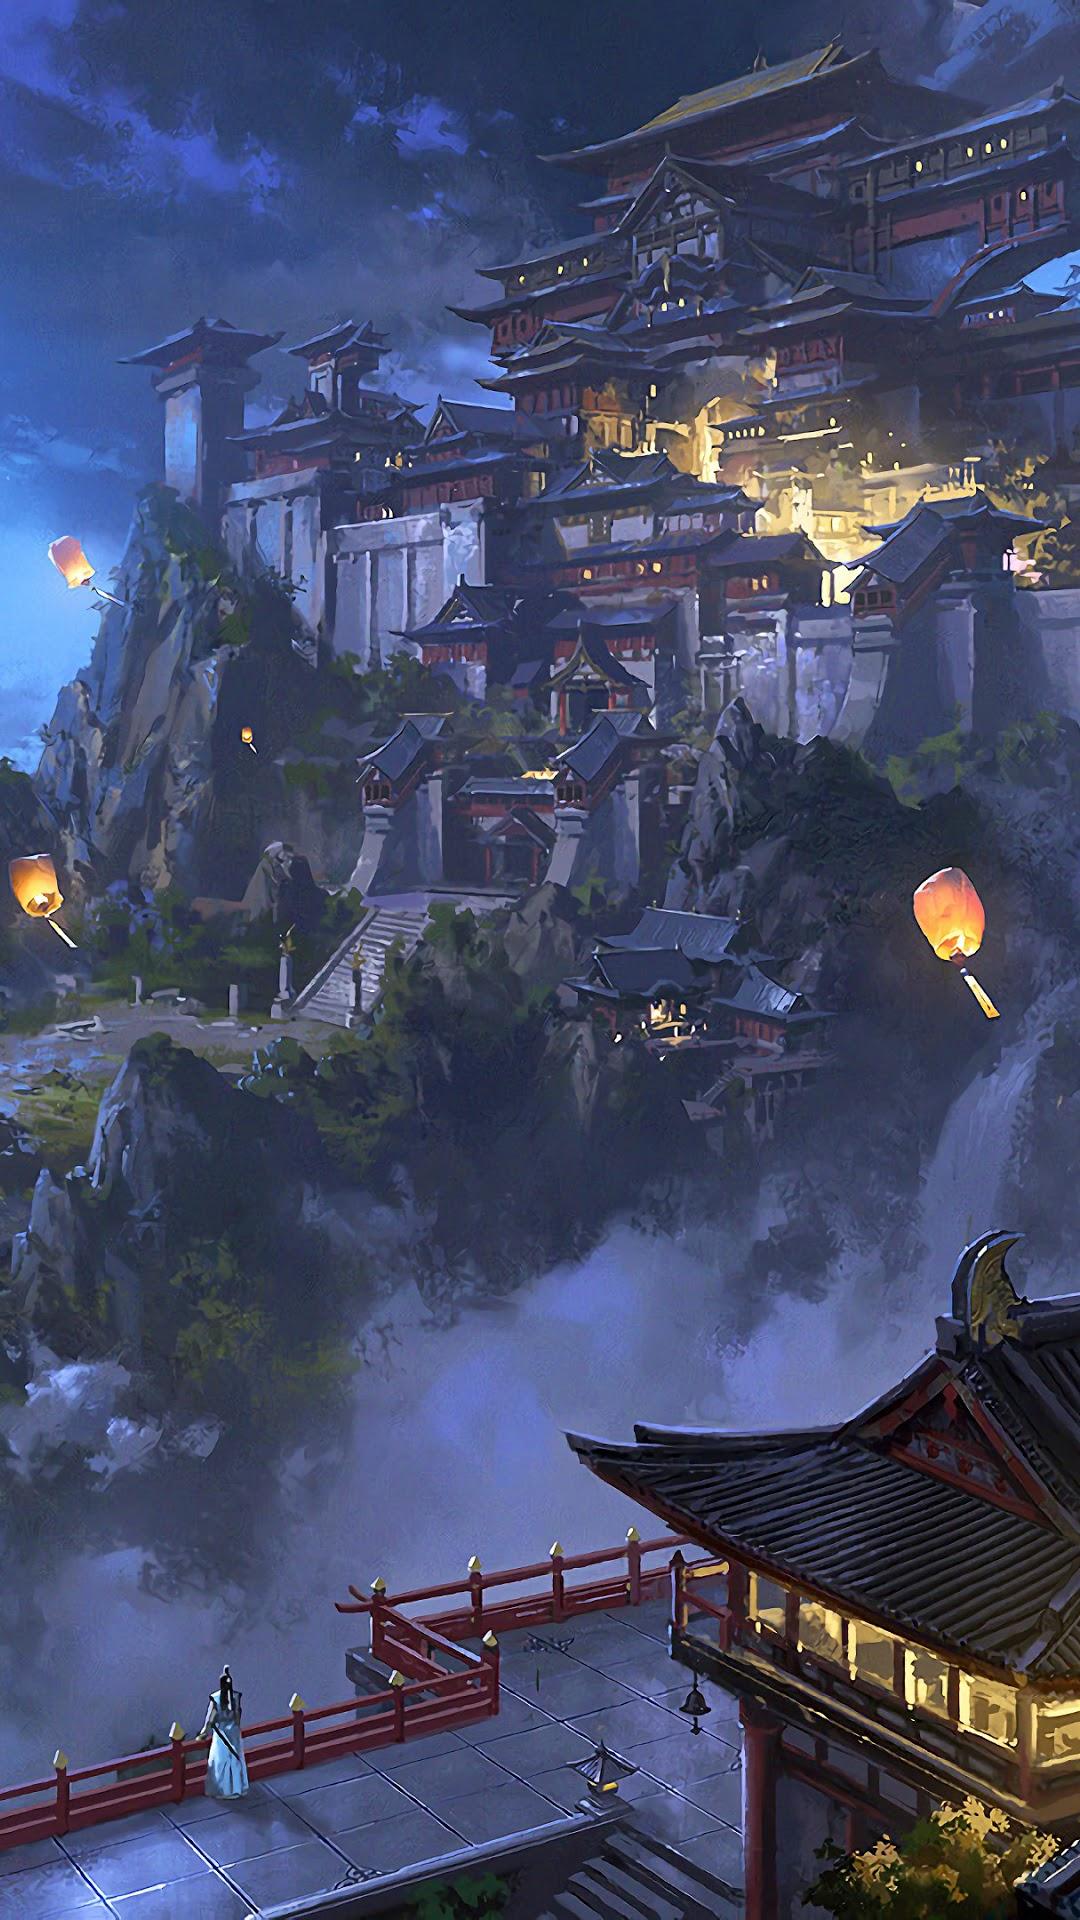 286 2868925 anime sky lantern mountain japanese castle night iphone